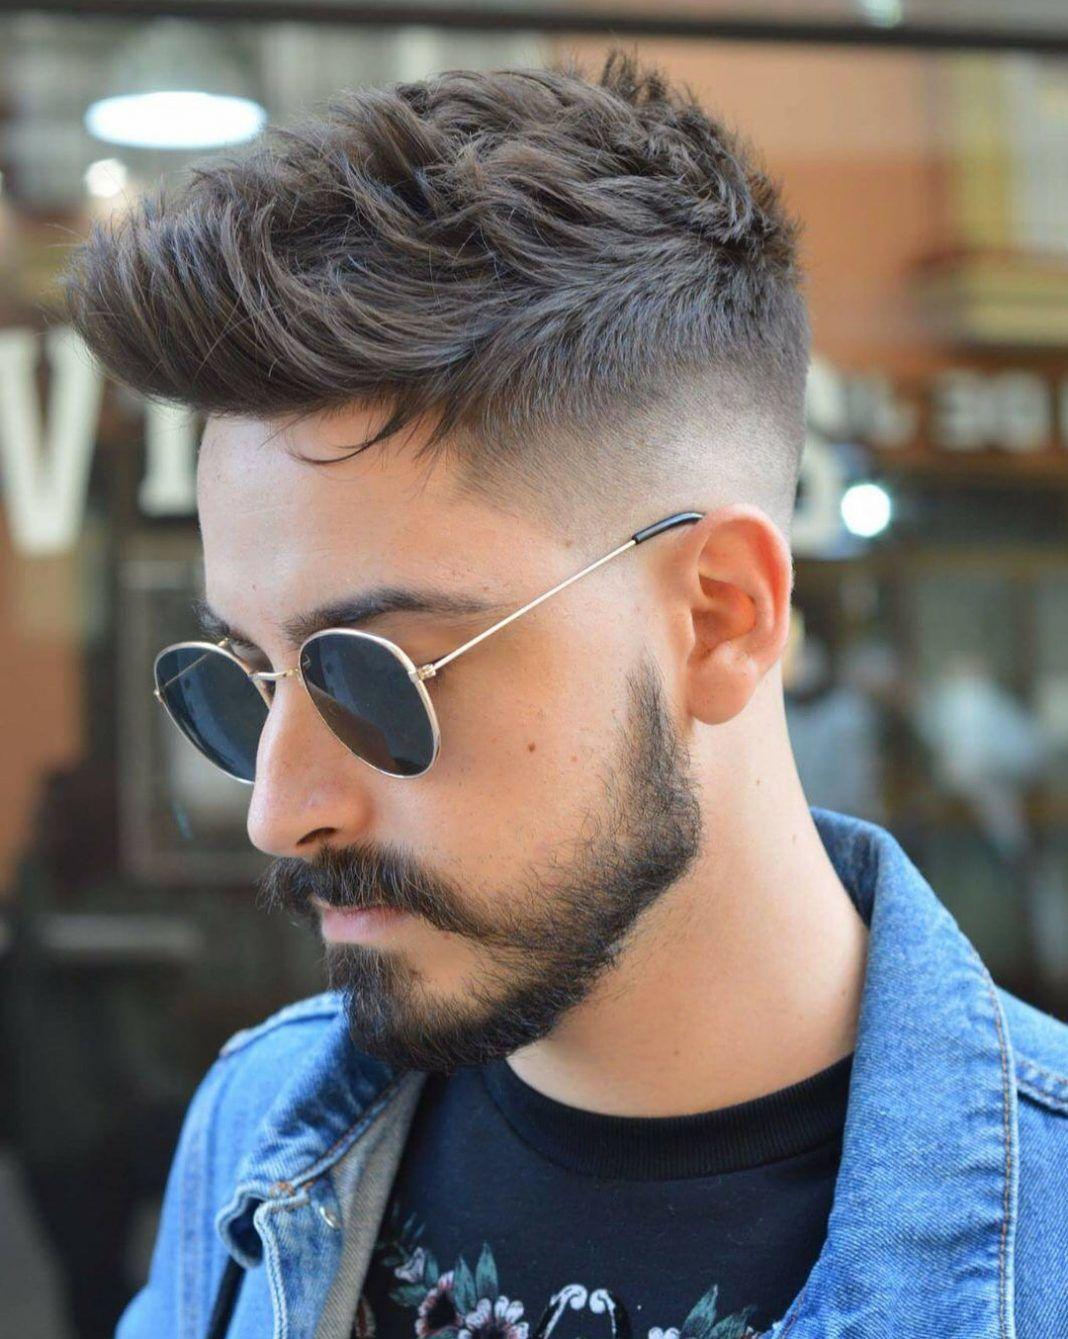 Top 100 Coiffures En Degrade Coupe Cheveux Homme Cheveux Homme Coupe De Cheveux